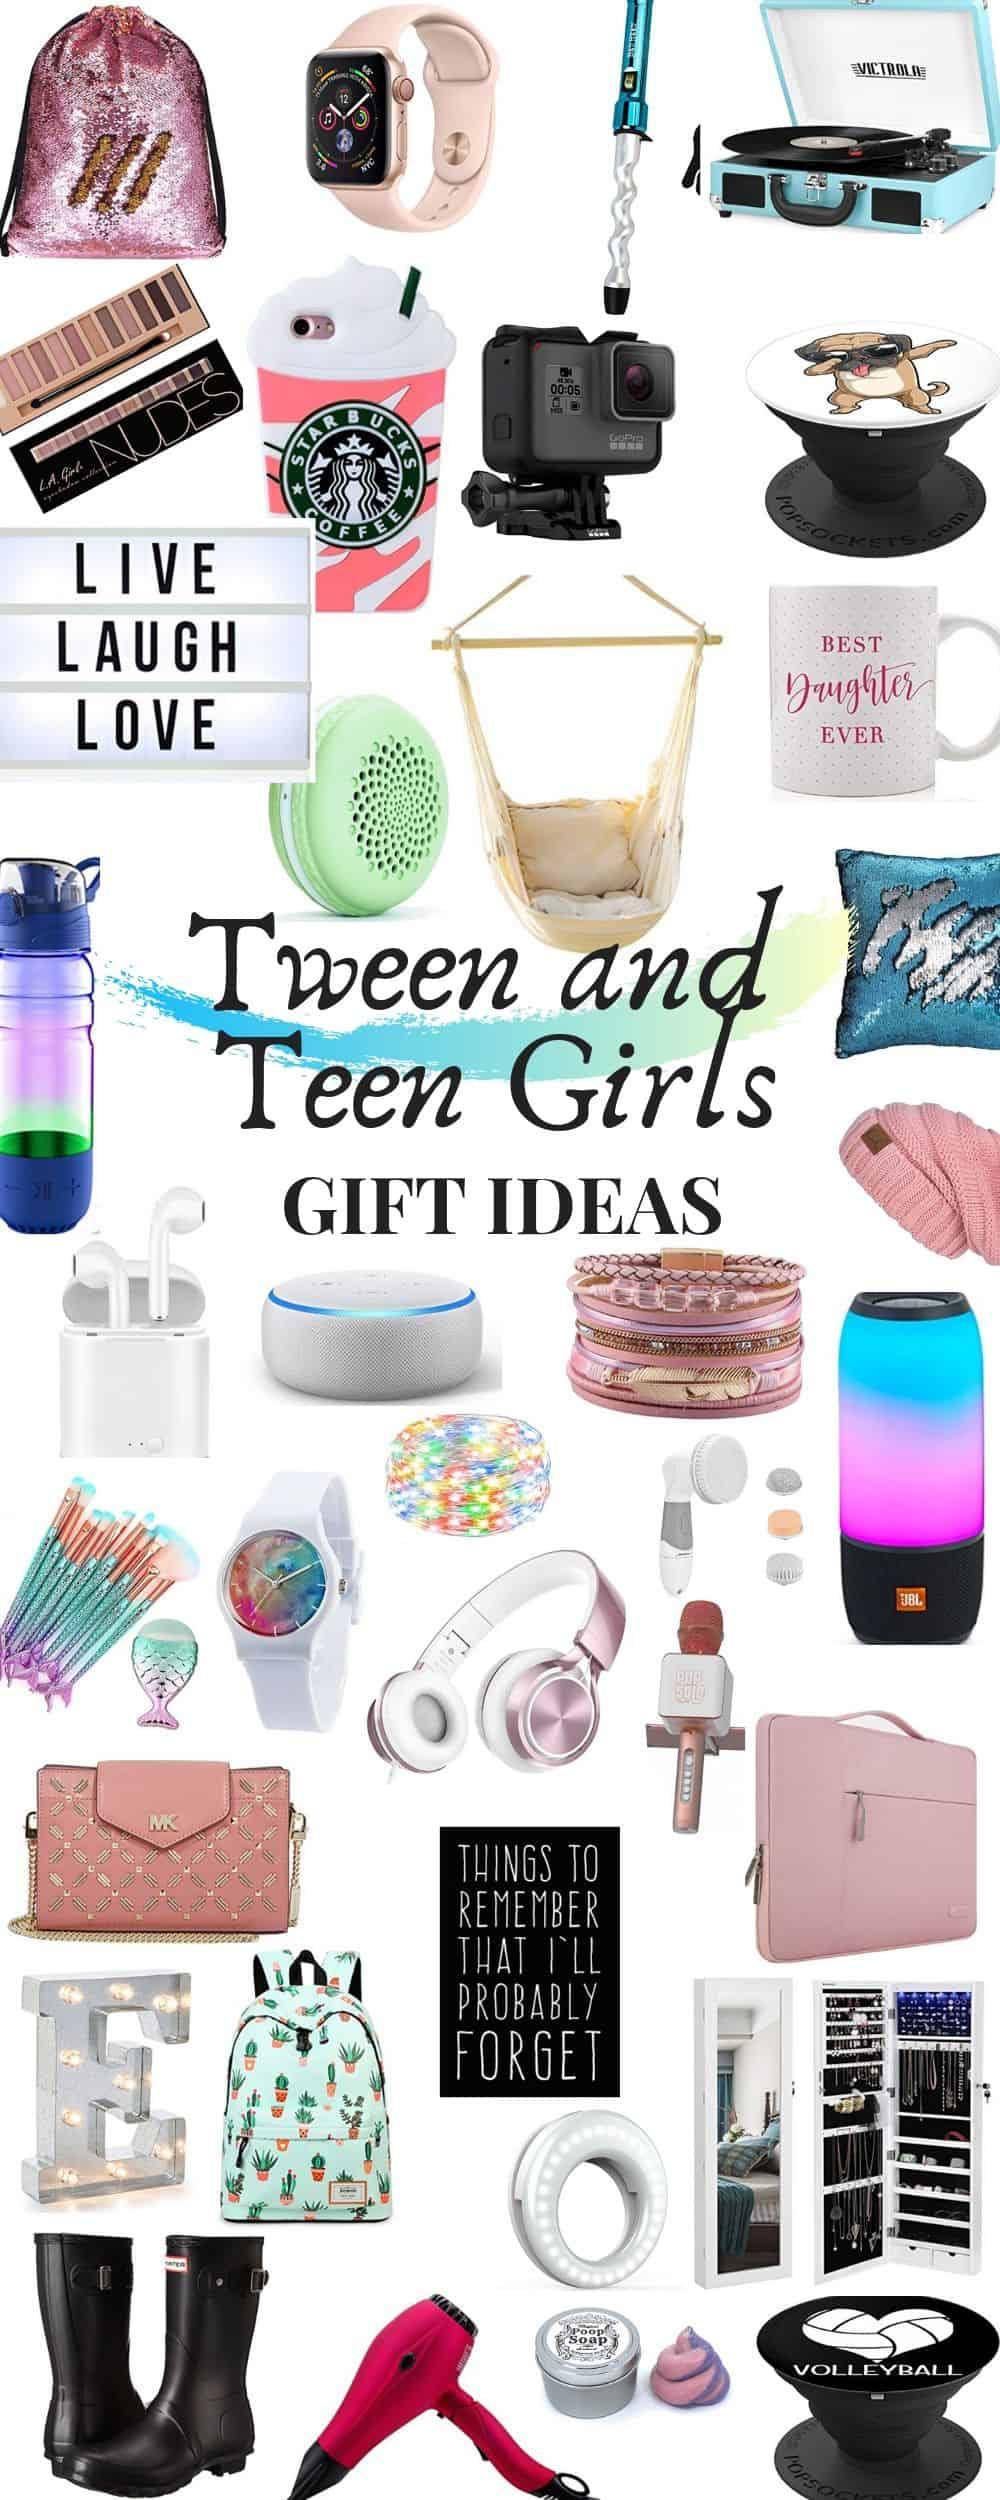 Teenage Girl And Tween Girl Gift Guide 2020 Ourkindofcrazy Com